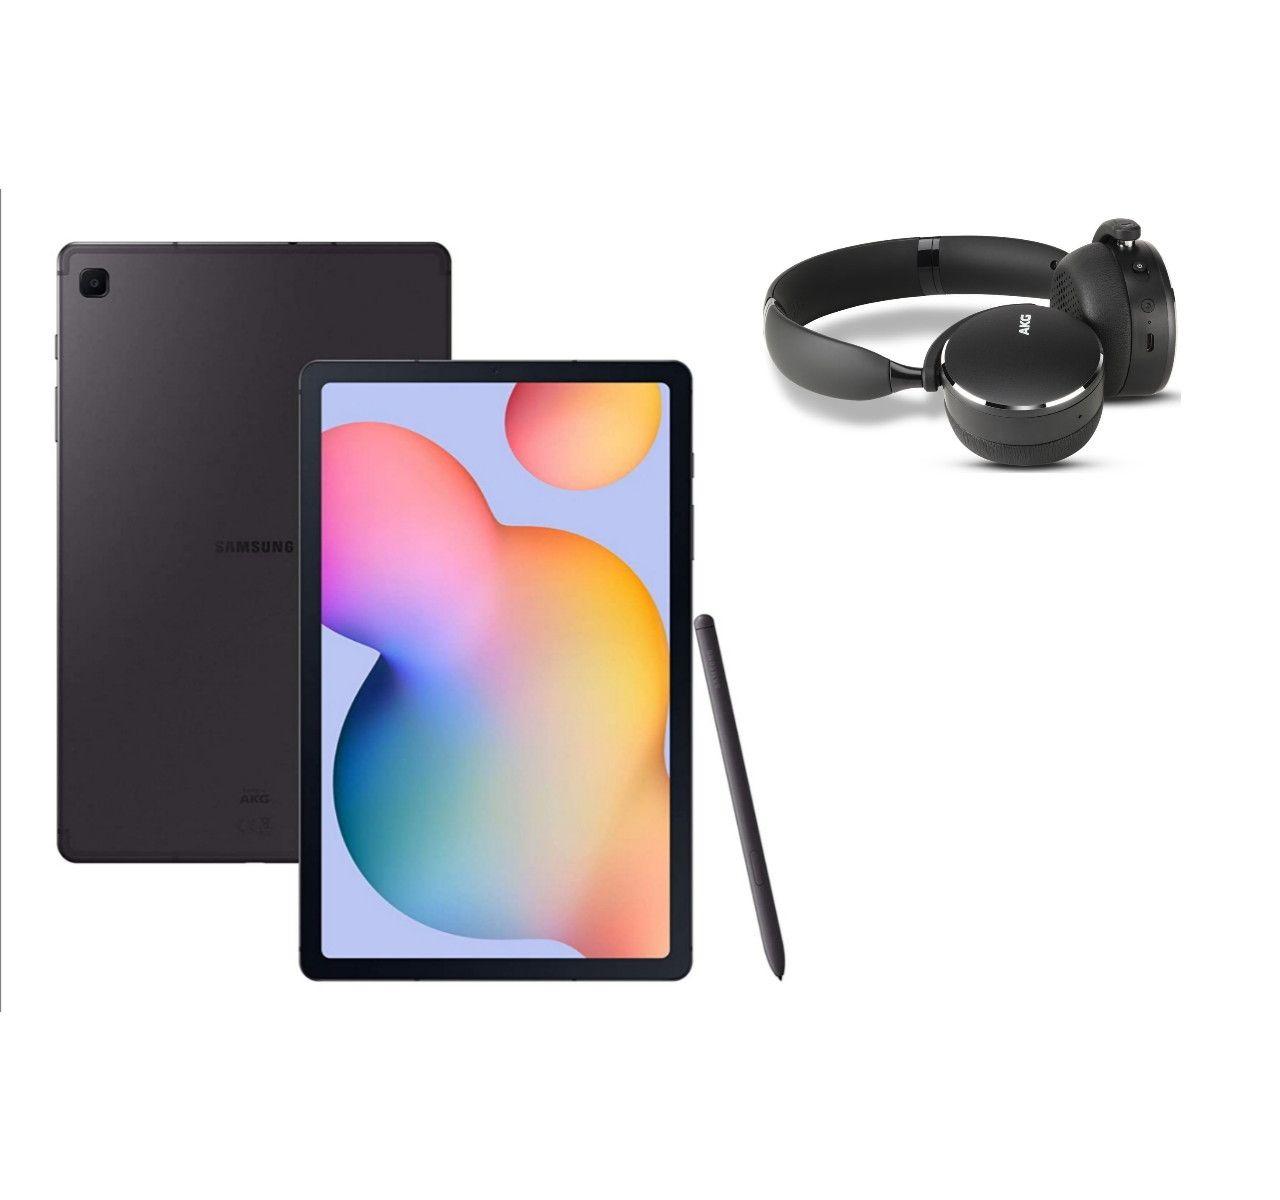 Samsung Galaxy Tab S6 Lite Wi-Fi - Oxford Grey (UK Version) + Free AKG Y500 Headphones - £299 @ Amazon